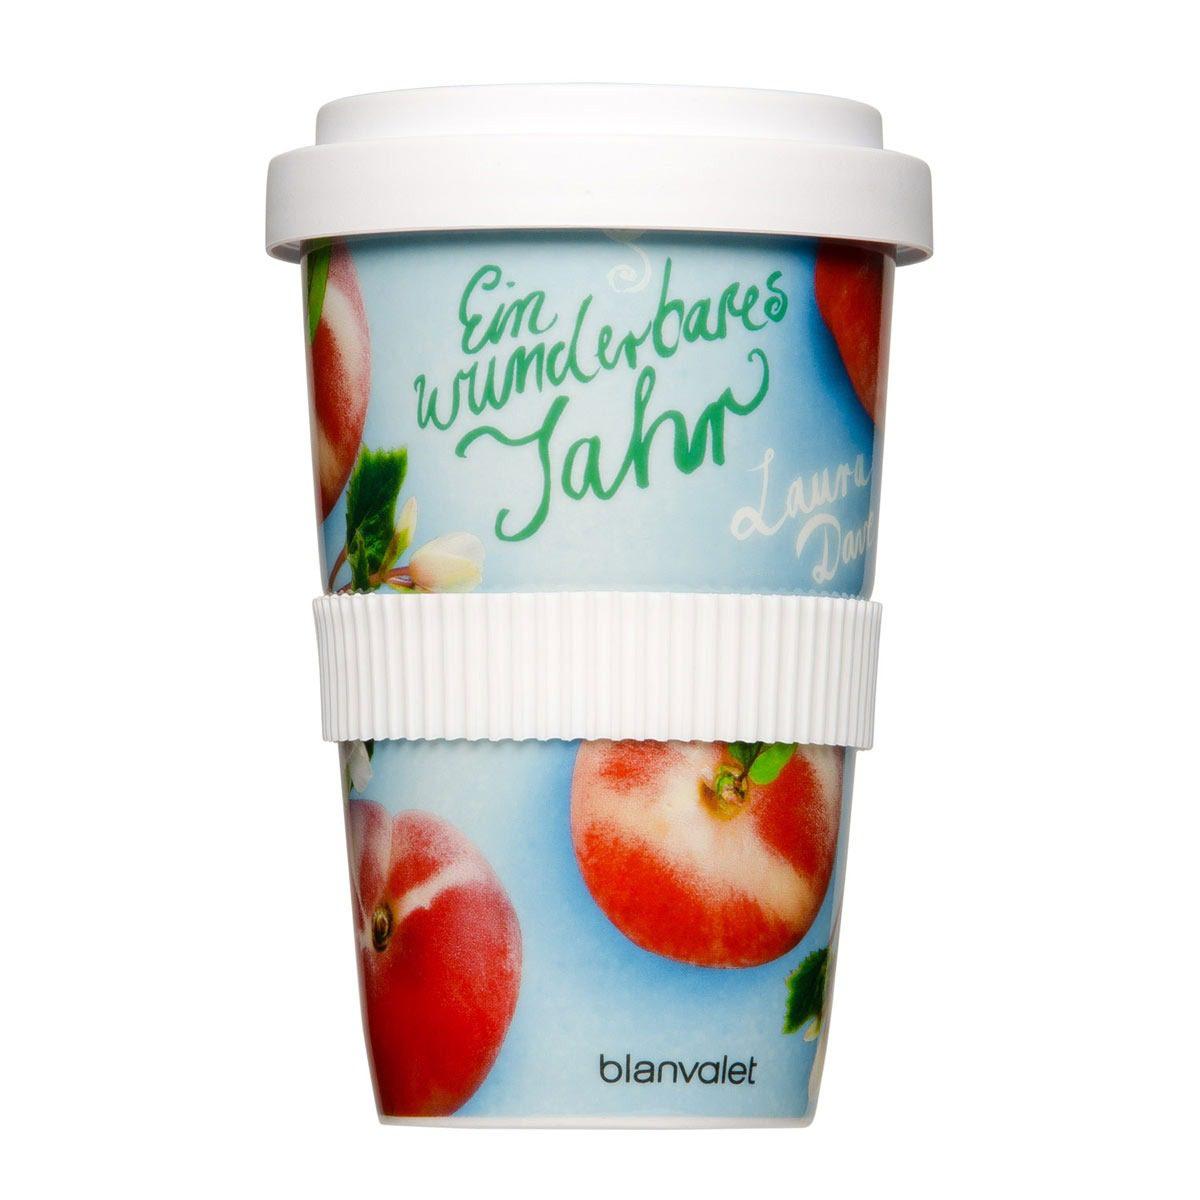 Coffee to Go photorealistic printed mug - Mahlwerck porcelain